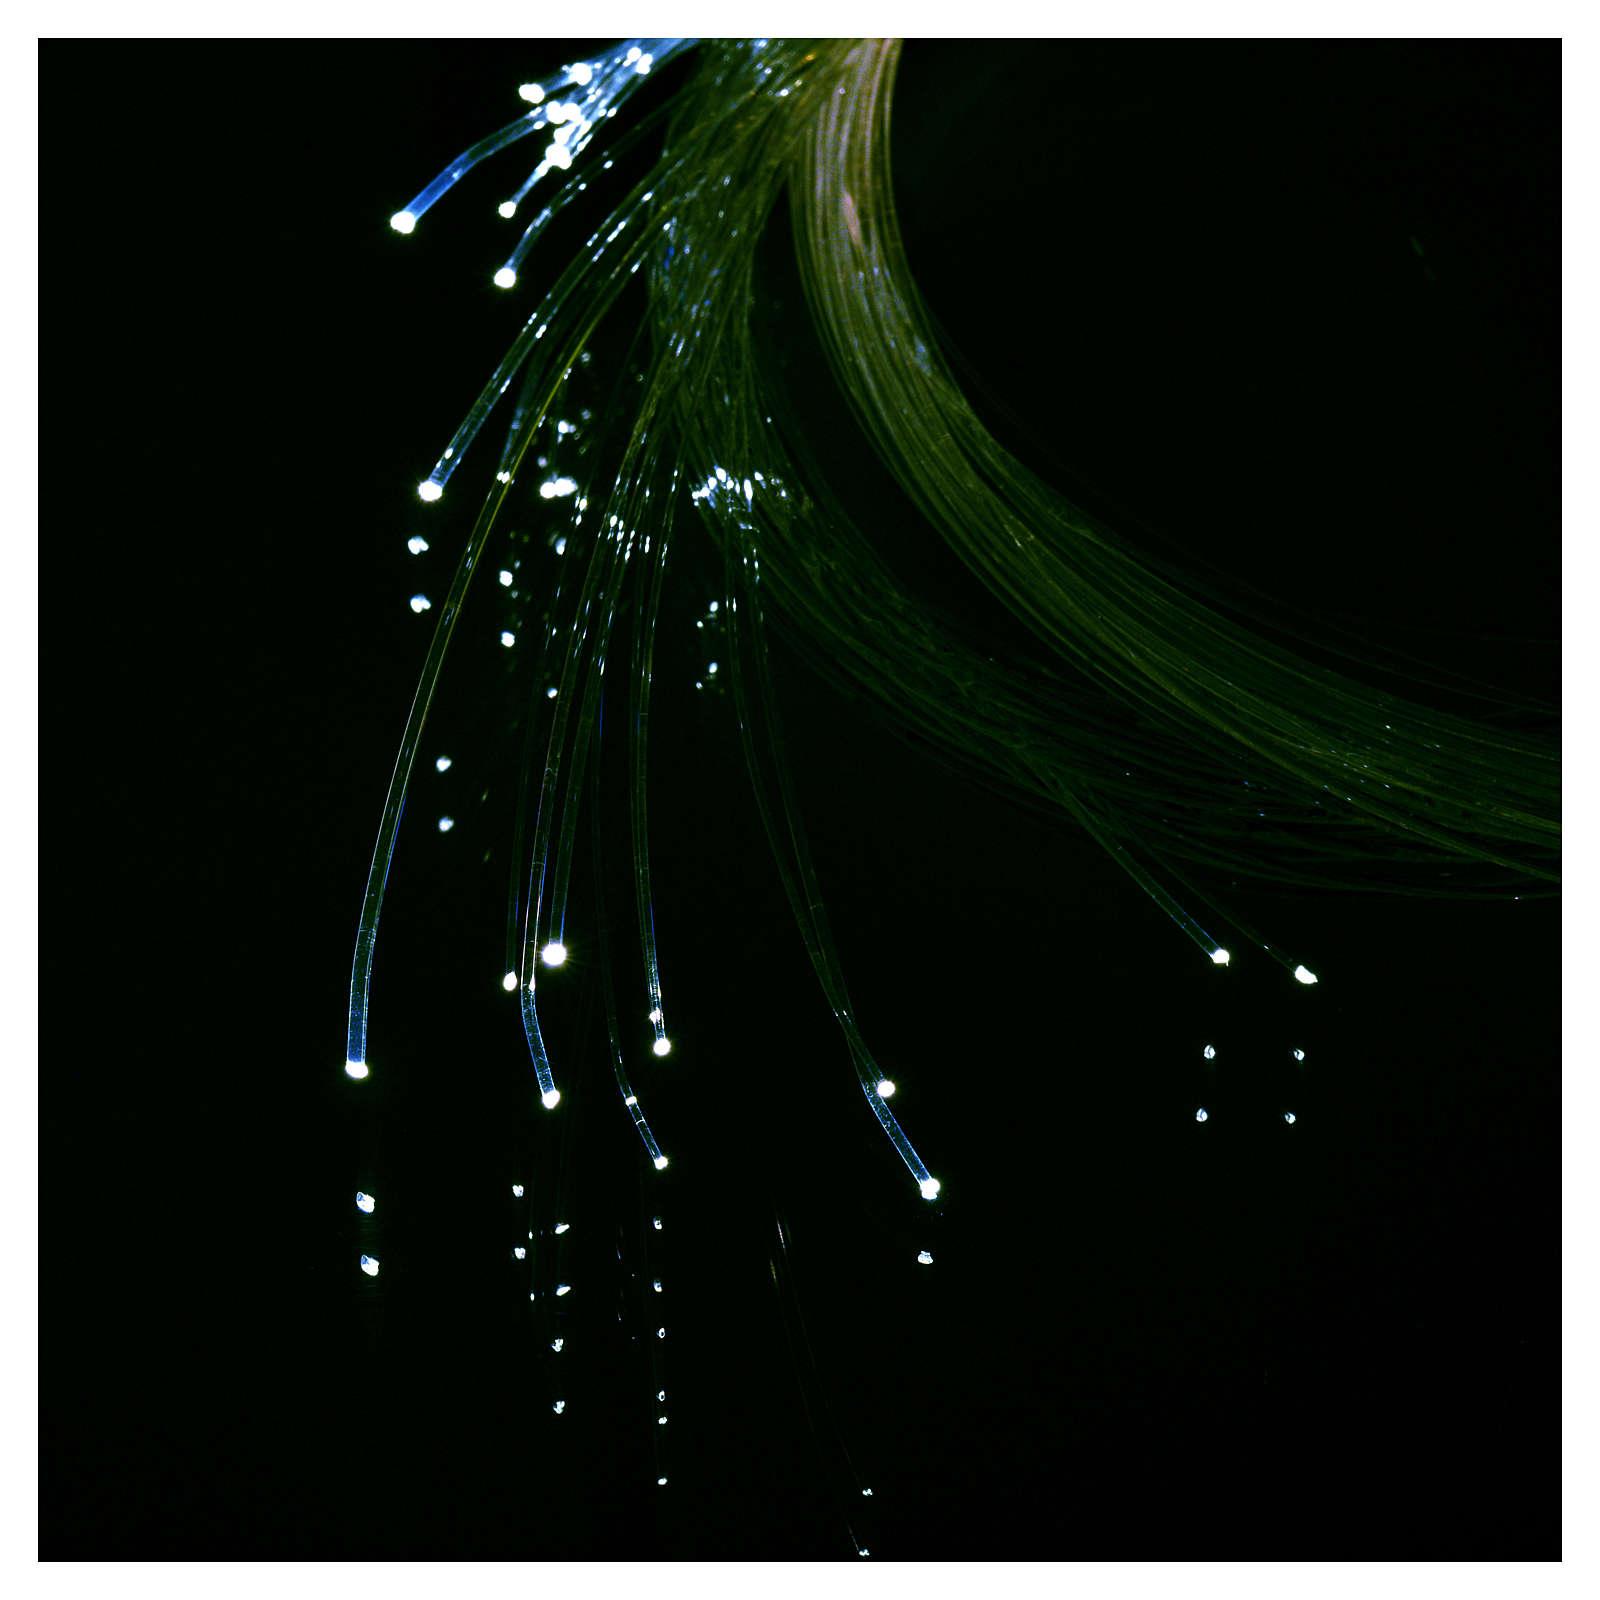 Estrellas Fibra Óptica 30 hilos 25W 220V 4